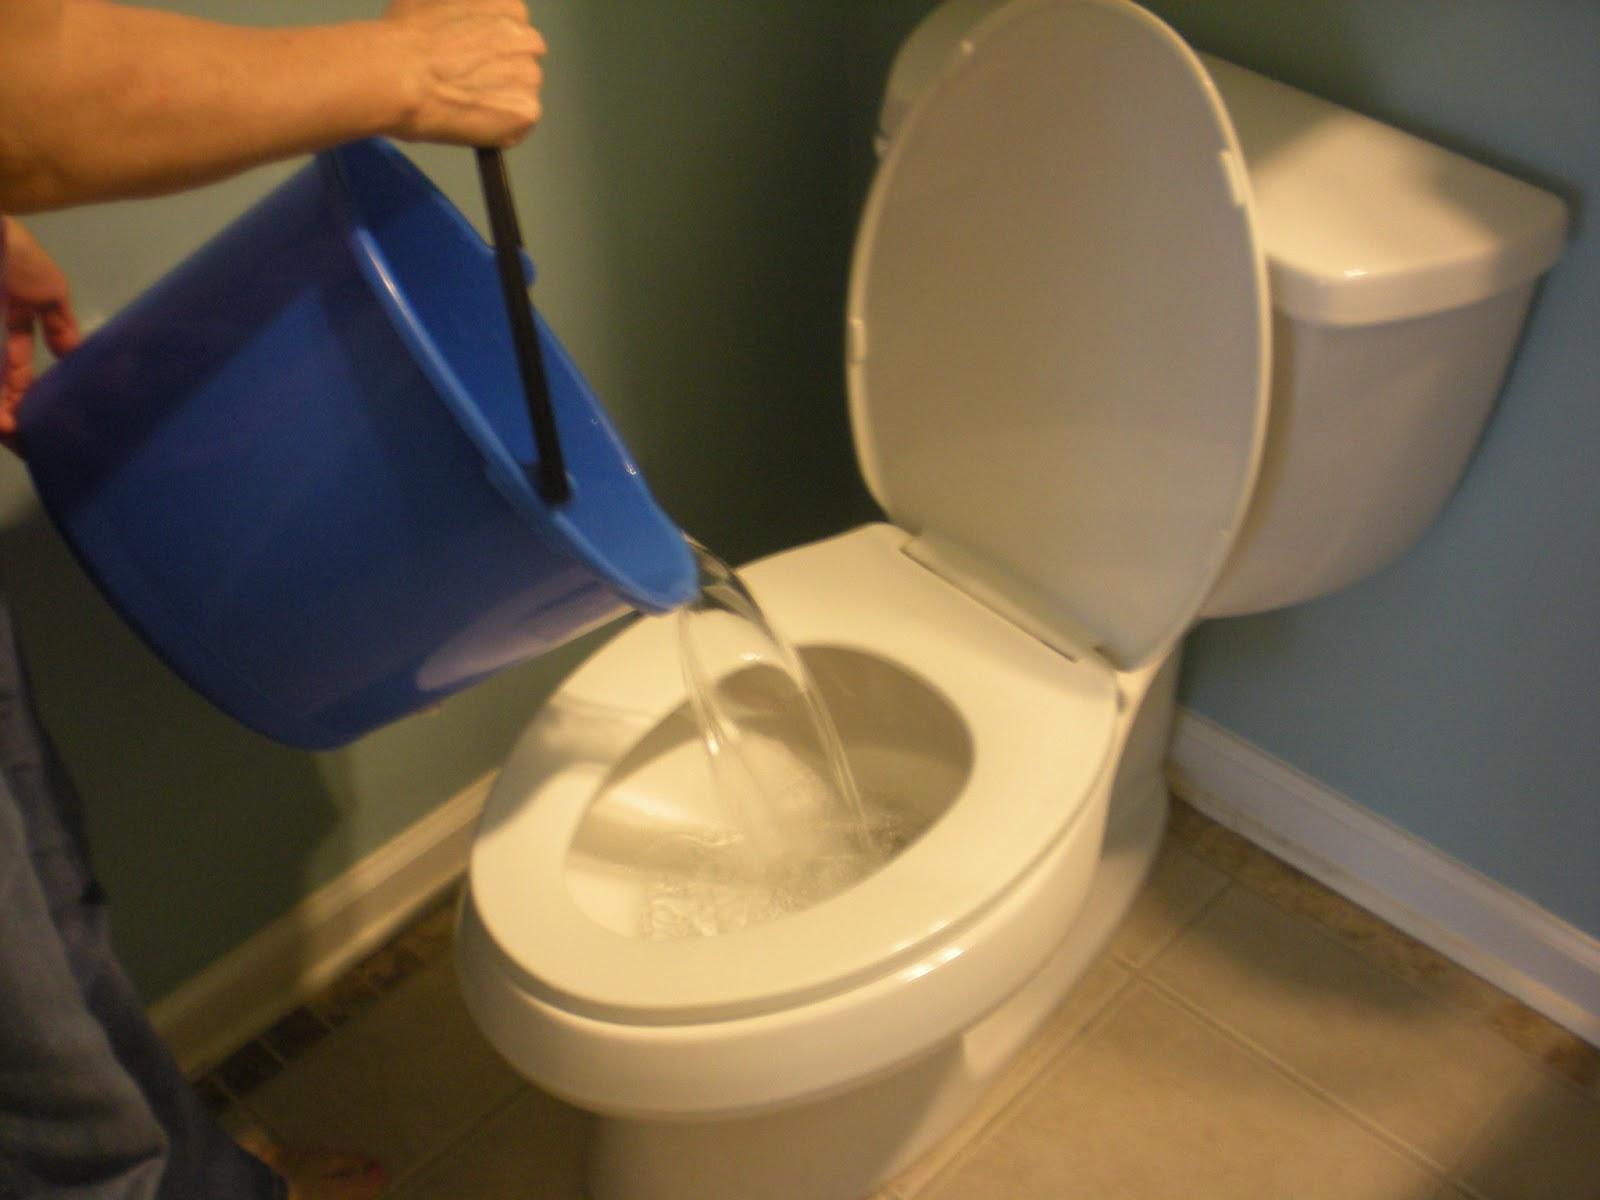 Flushing A Toilet Using Bucket